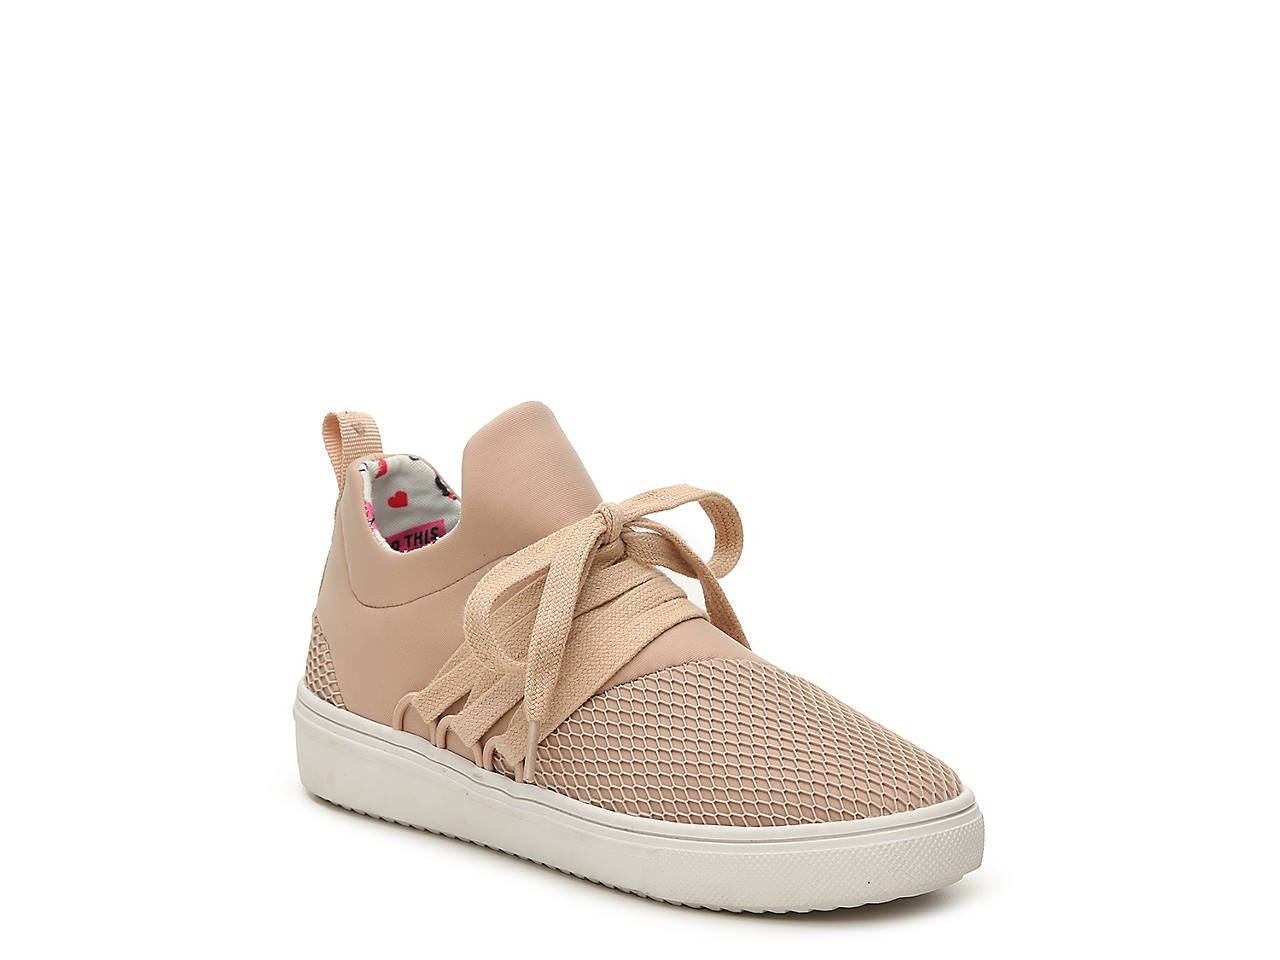 fe73be2cf7f Steve Madden. Lancer Toddler   Youth Sneaker. InStock.  39.99. Minimum Clearance  Price ...